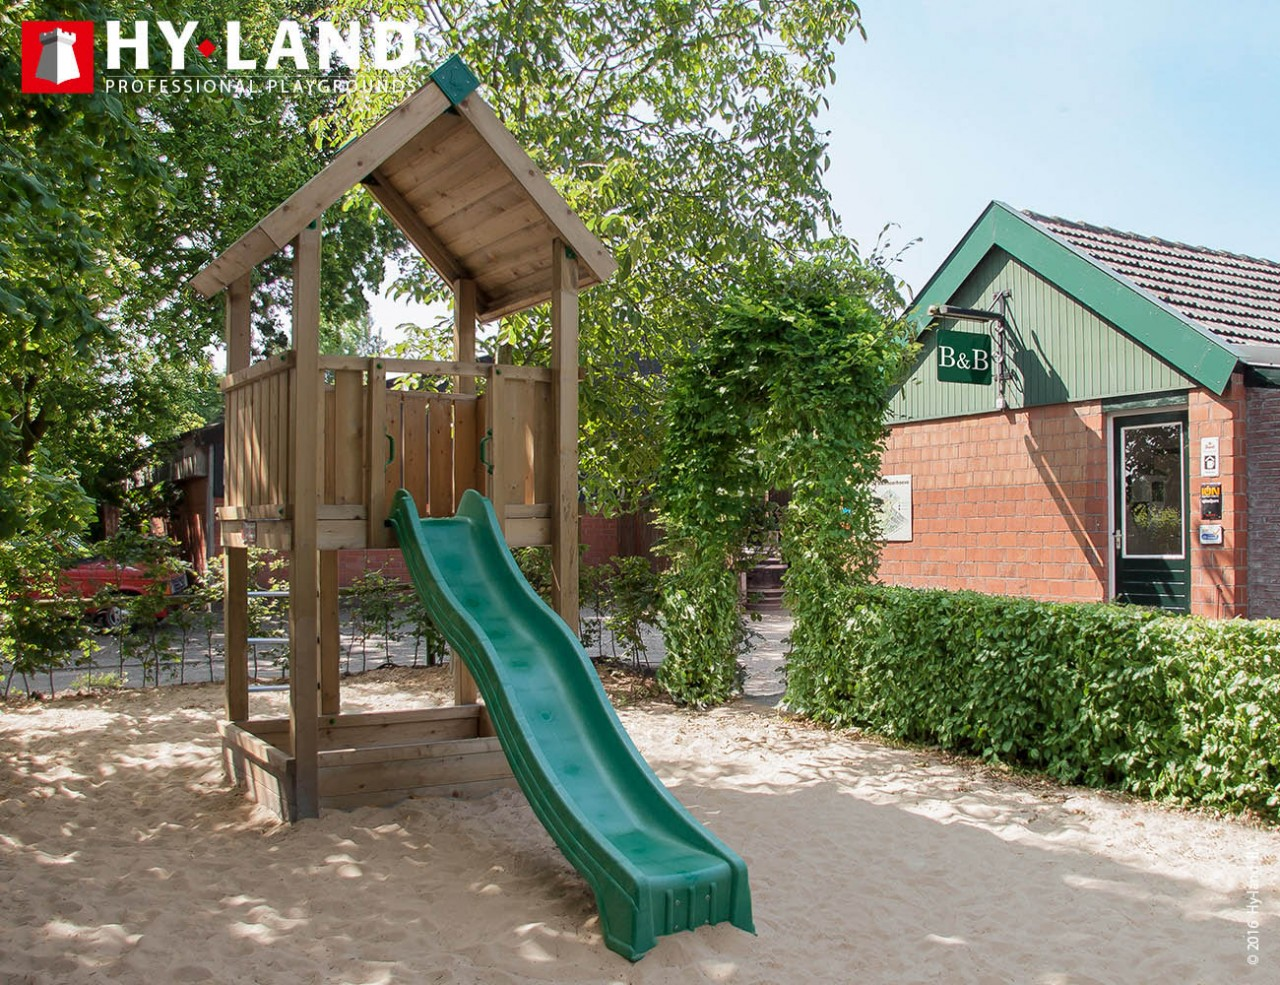 Spielturm Hy-Land P2